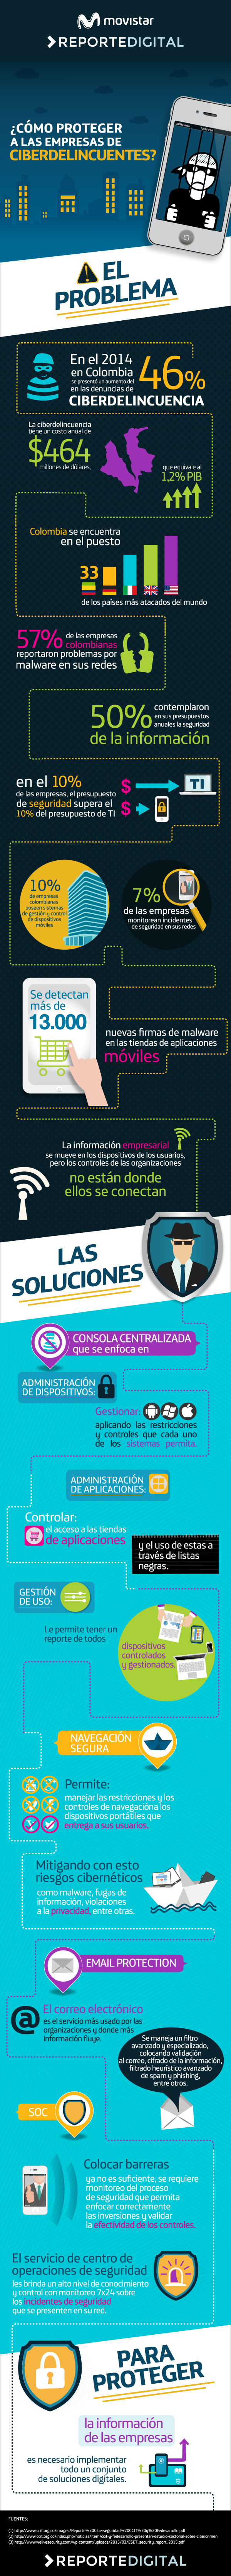 proteger-empresas-ciberdelincuencia-infografia